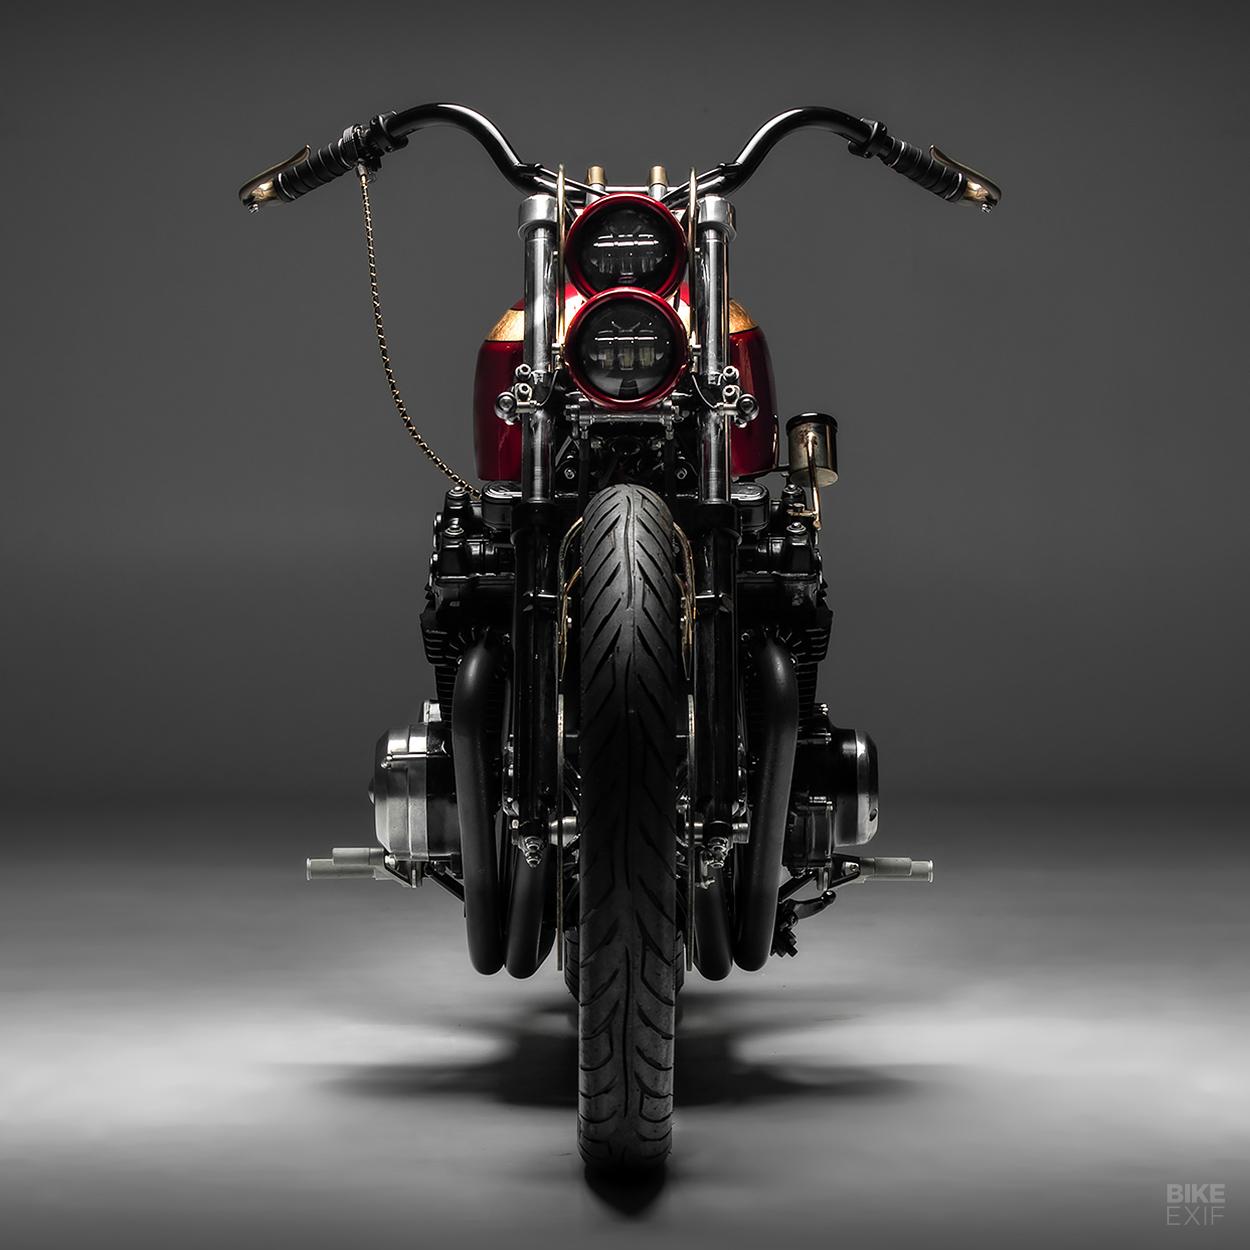 Honda CB900 chopper by Purpose Built Moto